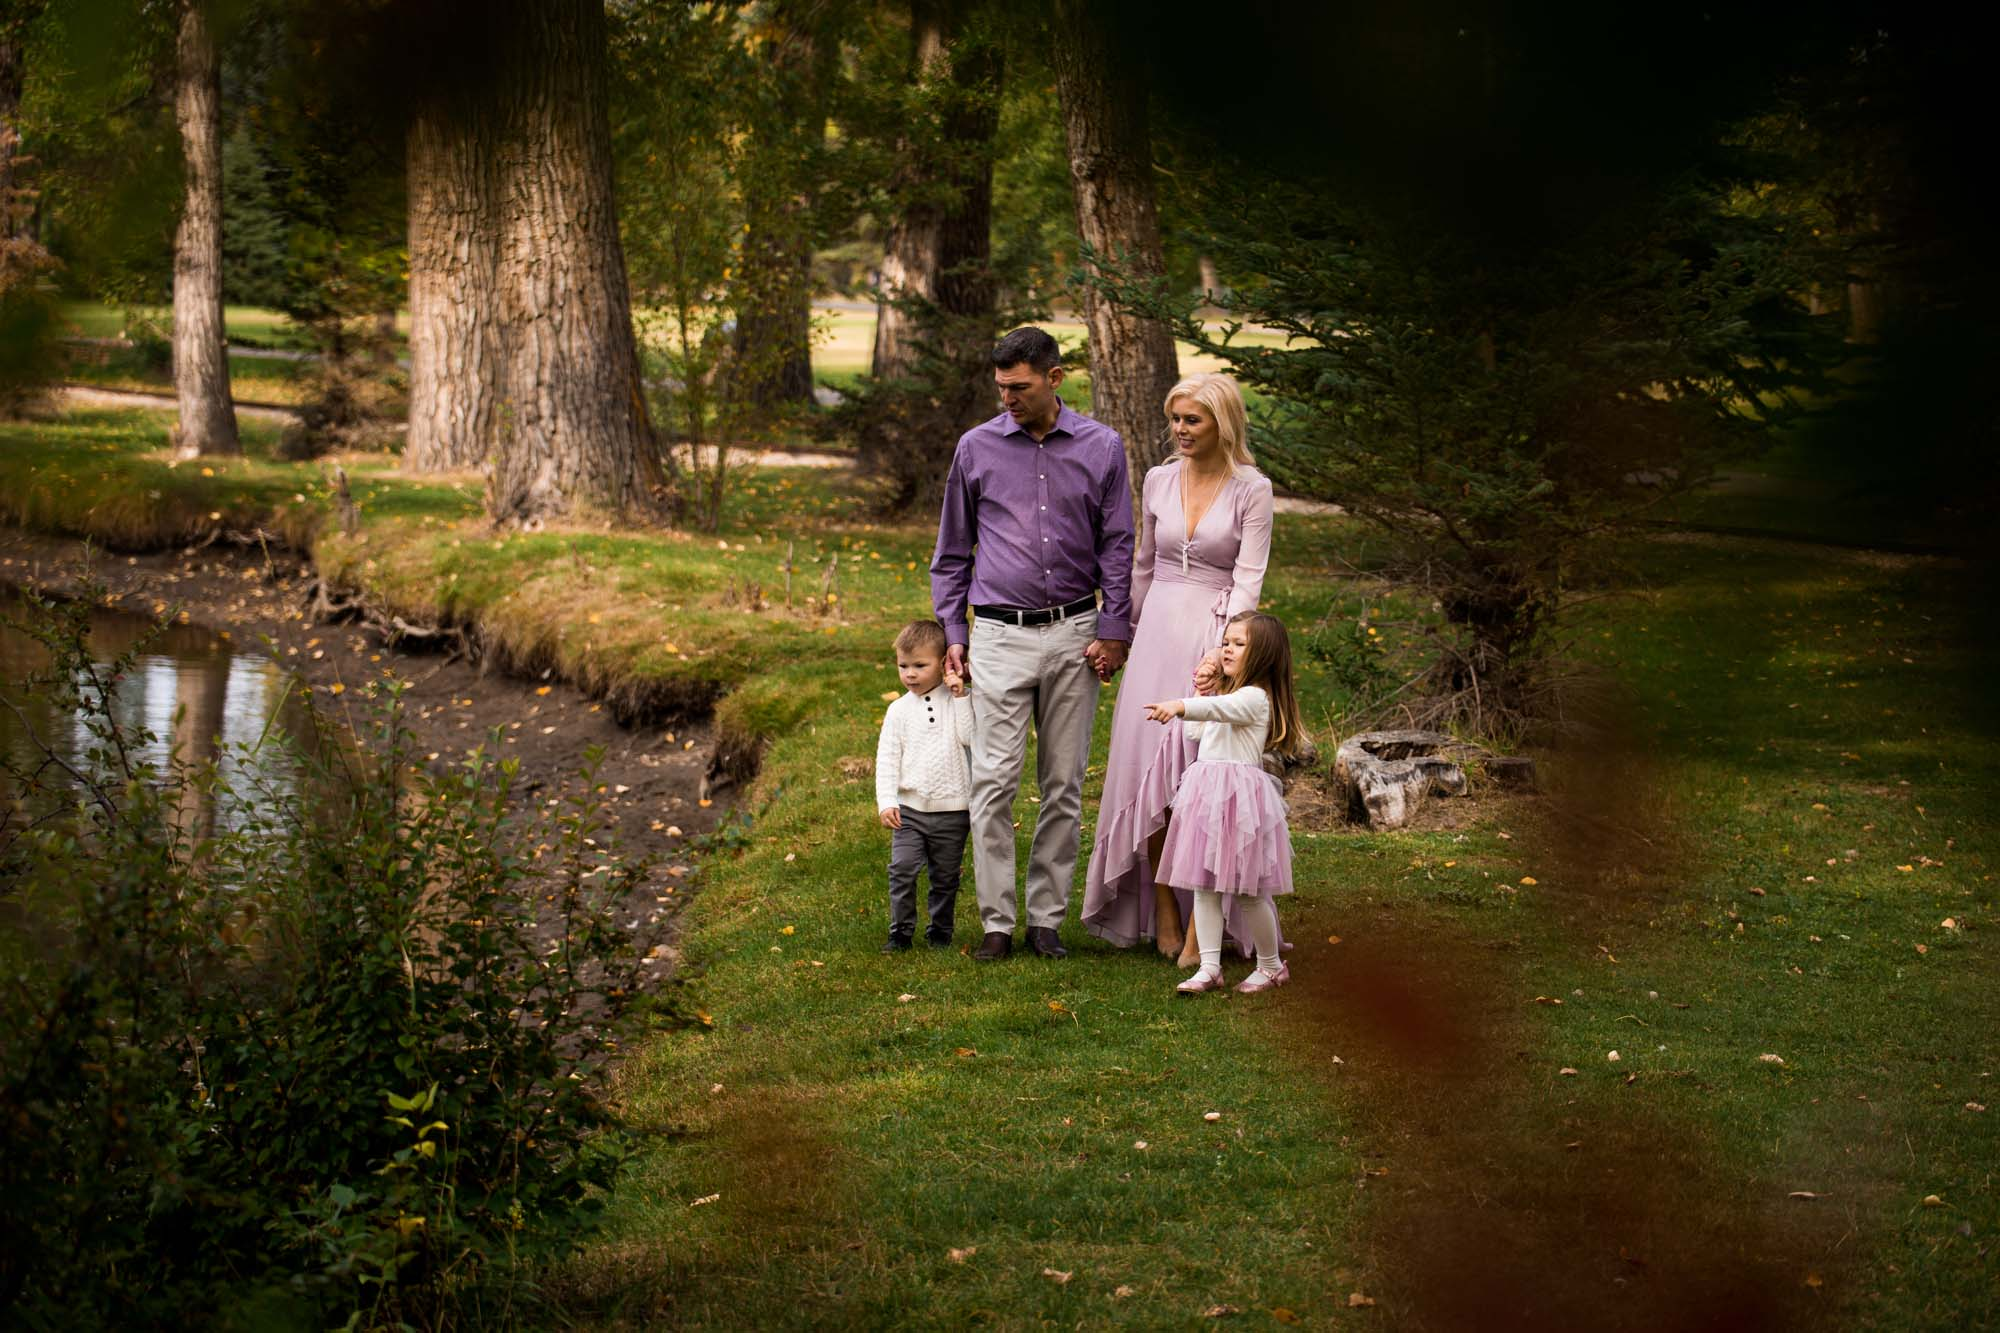 Calgary family photographer - family photography at Bowness Park